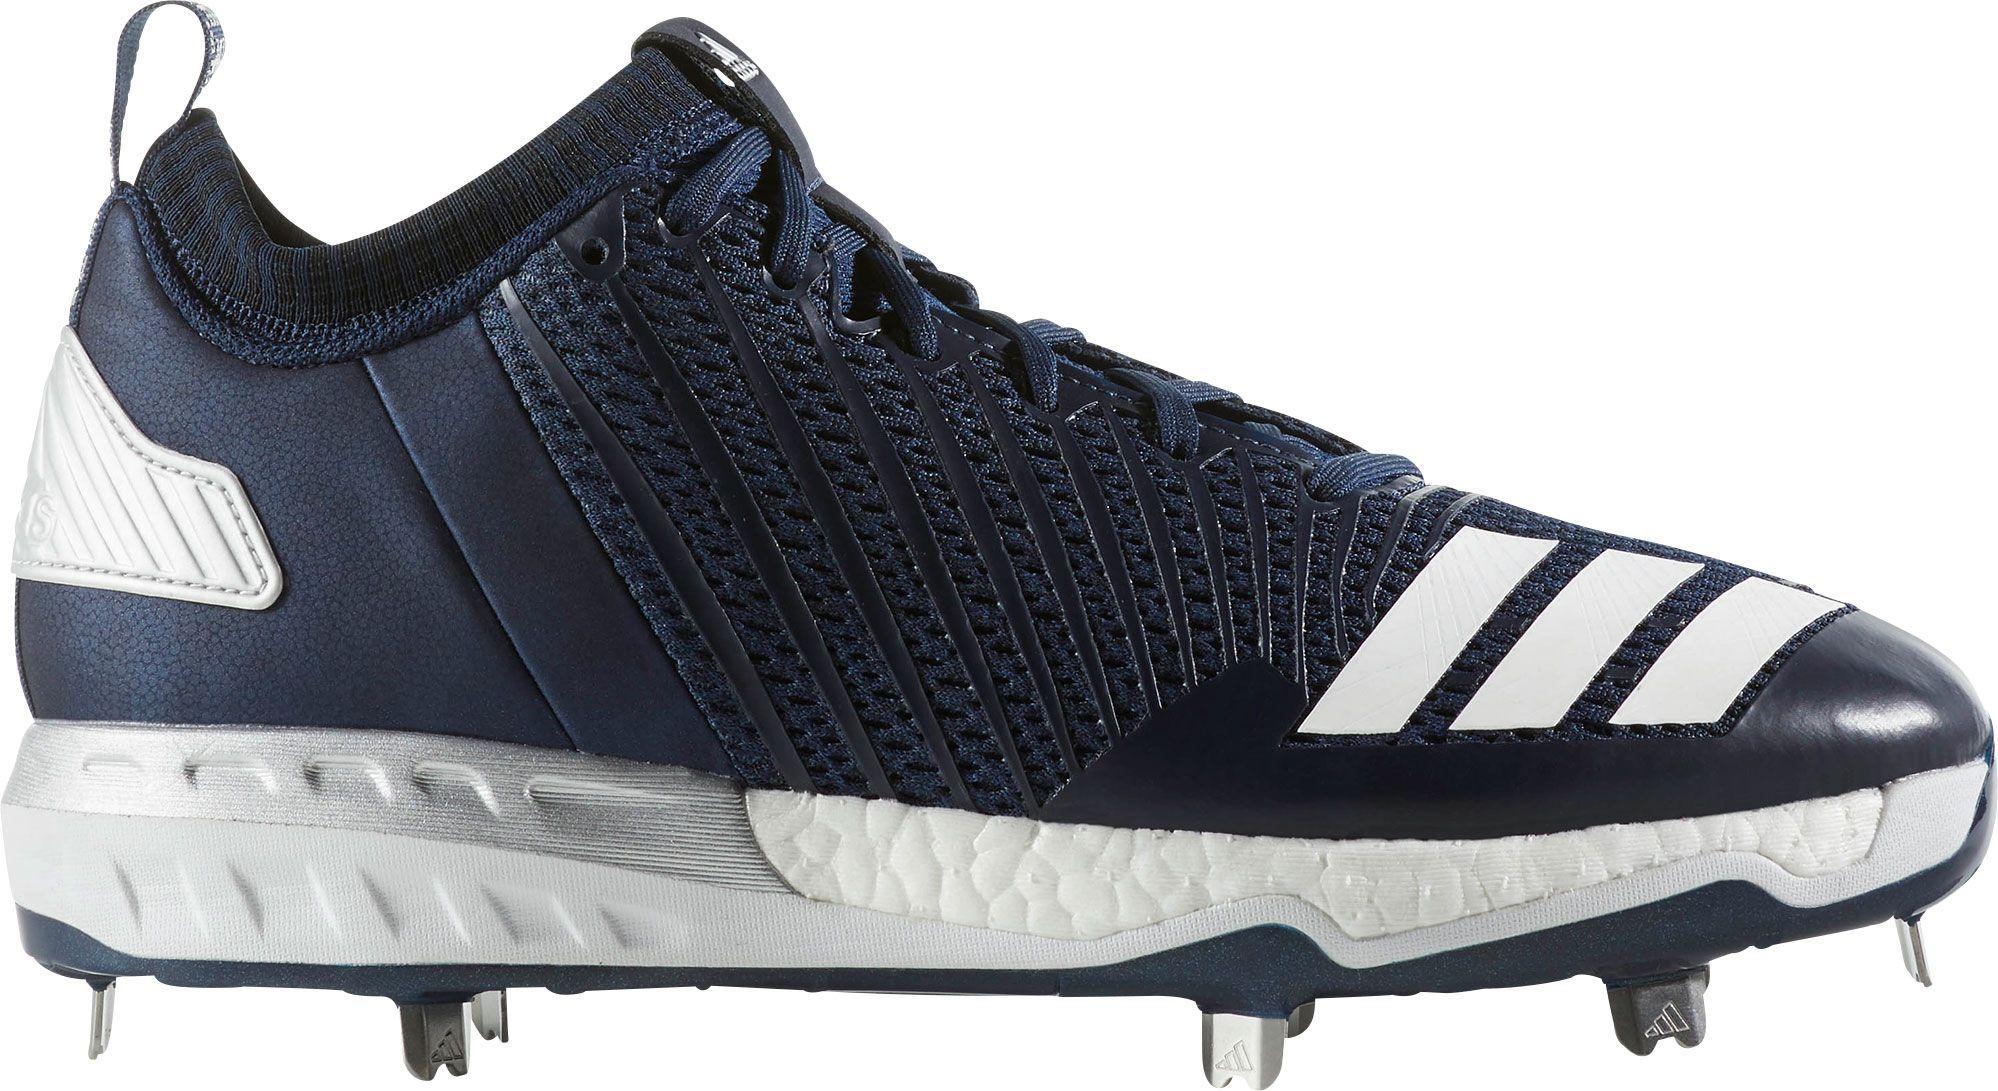 Metal Baseball Cleats, Size: 7.0, Blue